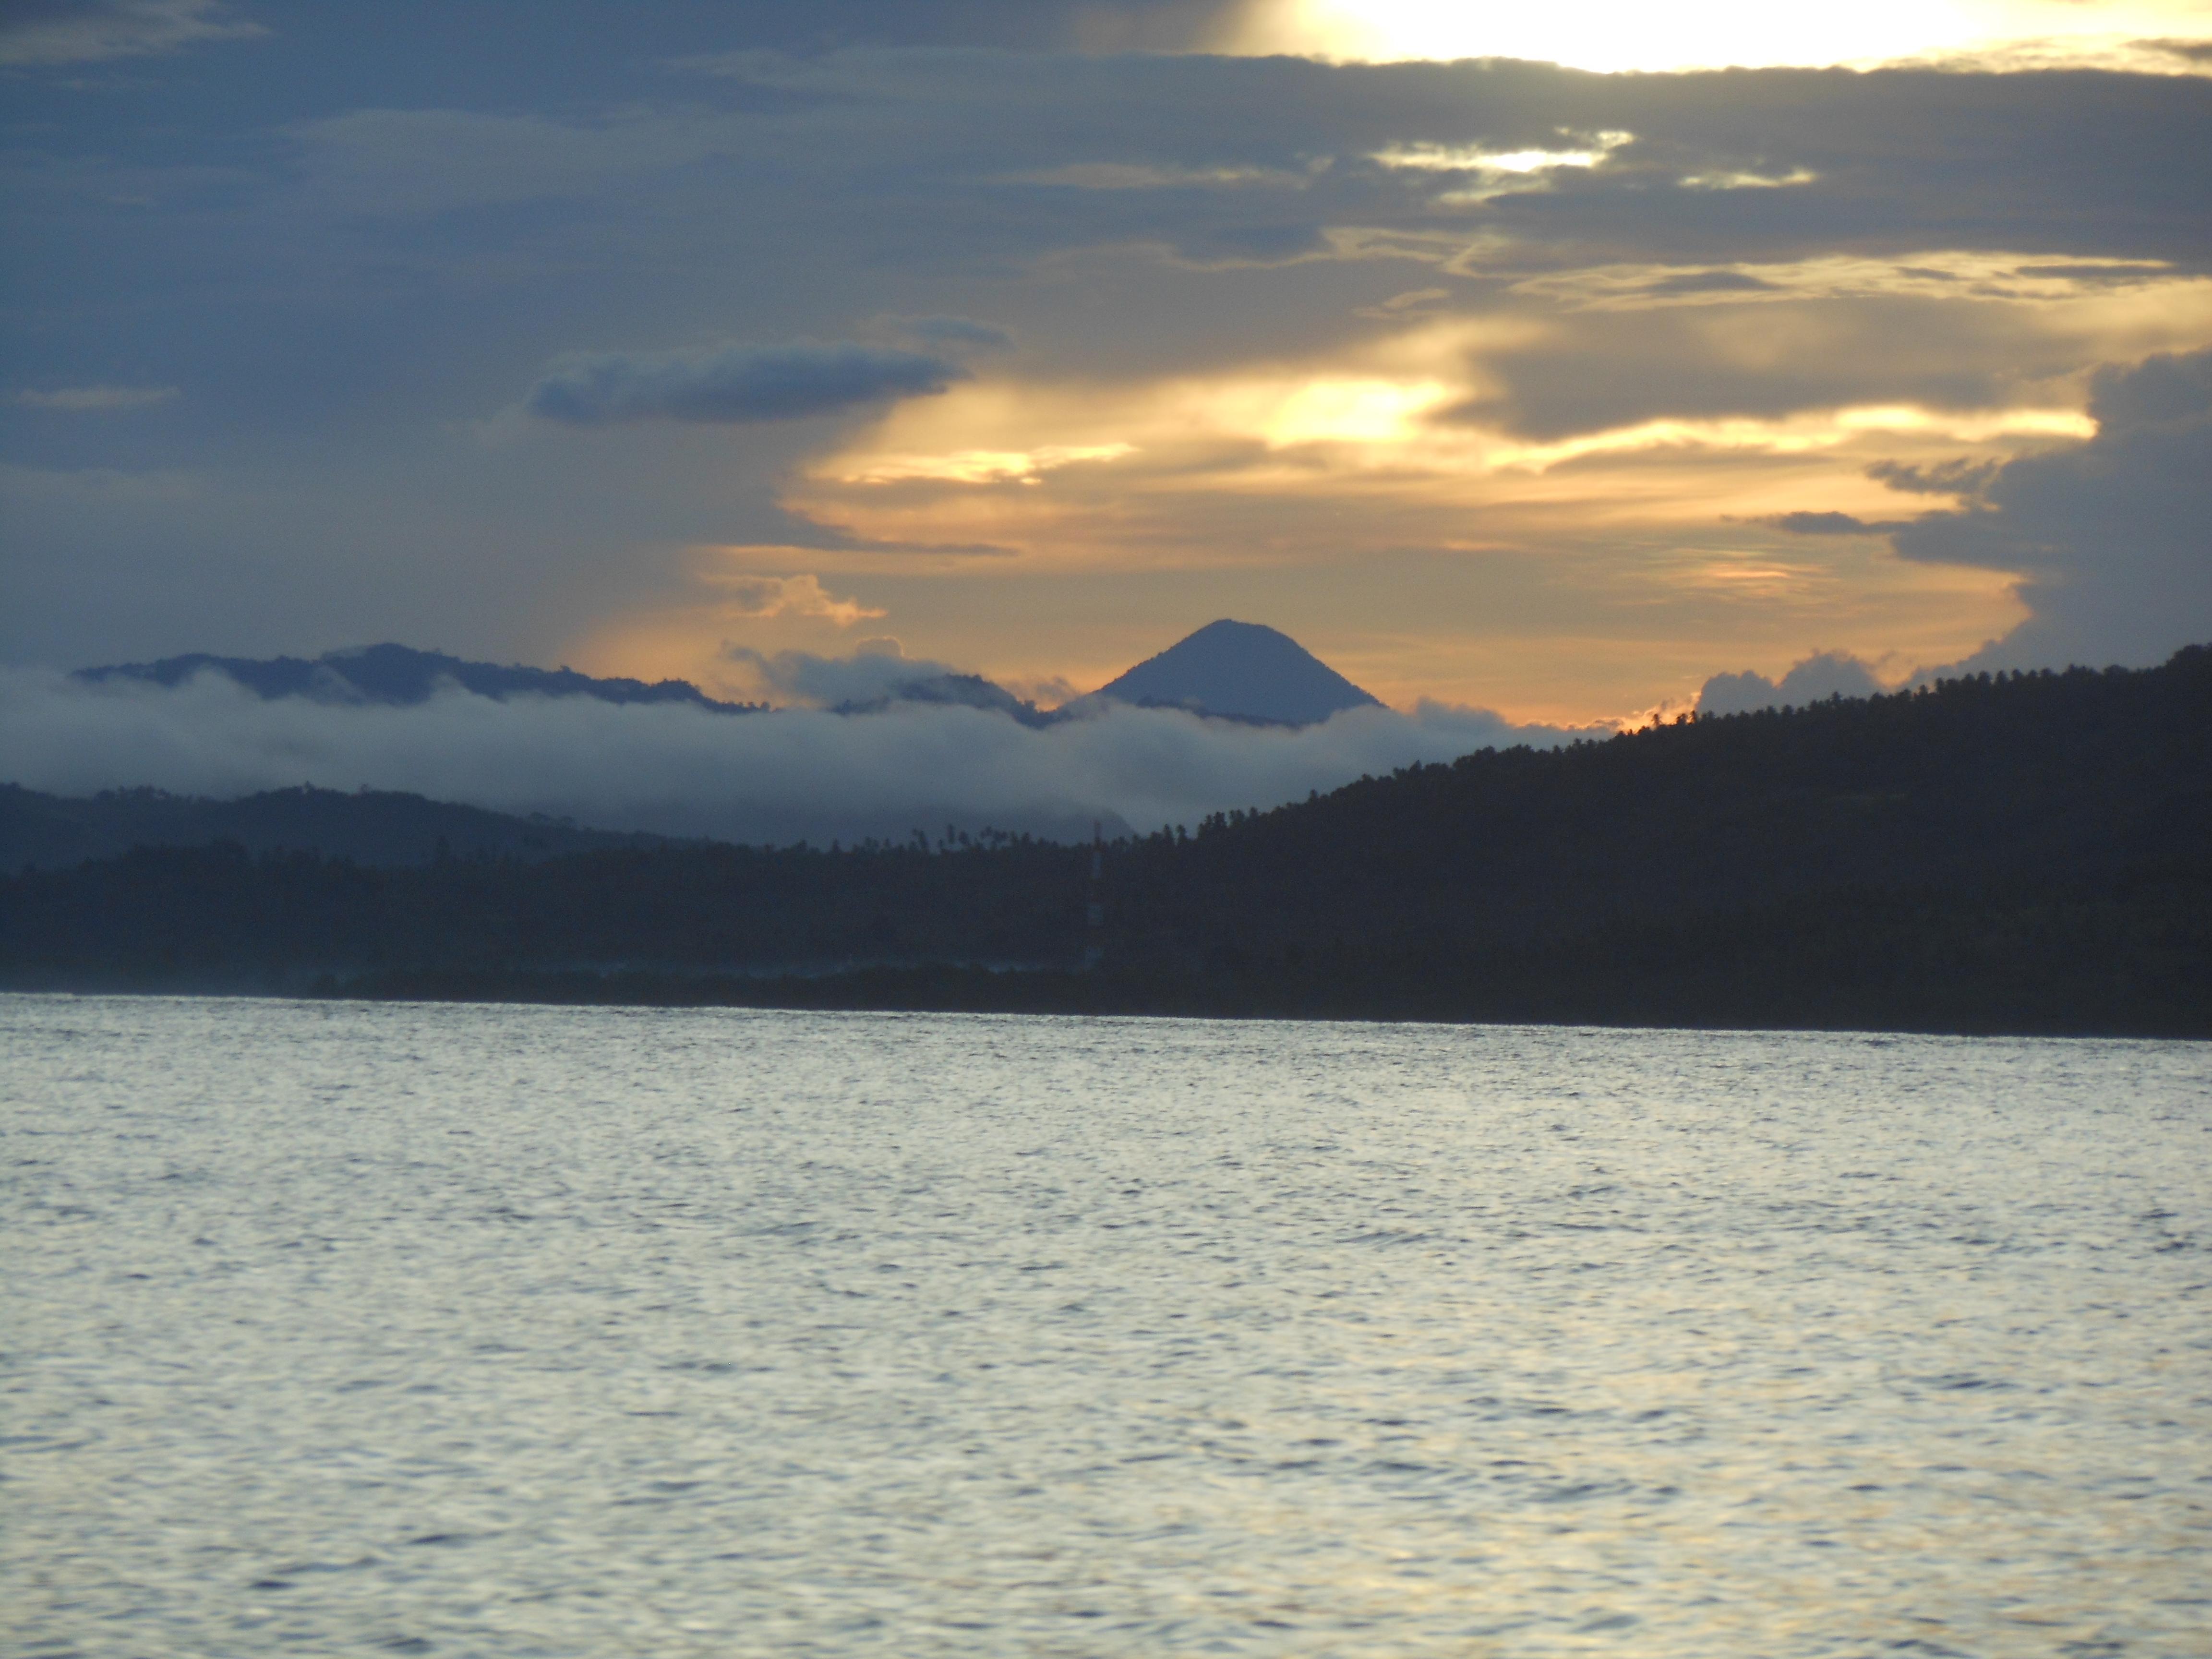 Gunung Dua Saudara Bagging Tomohon Bunaken Tangkoko 144 Duasaudara Kota